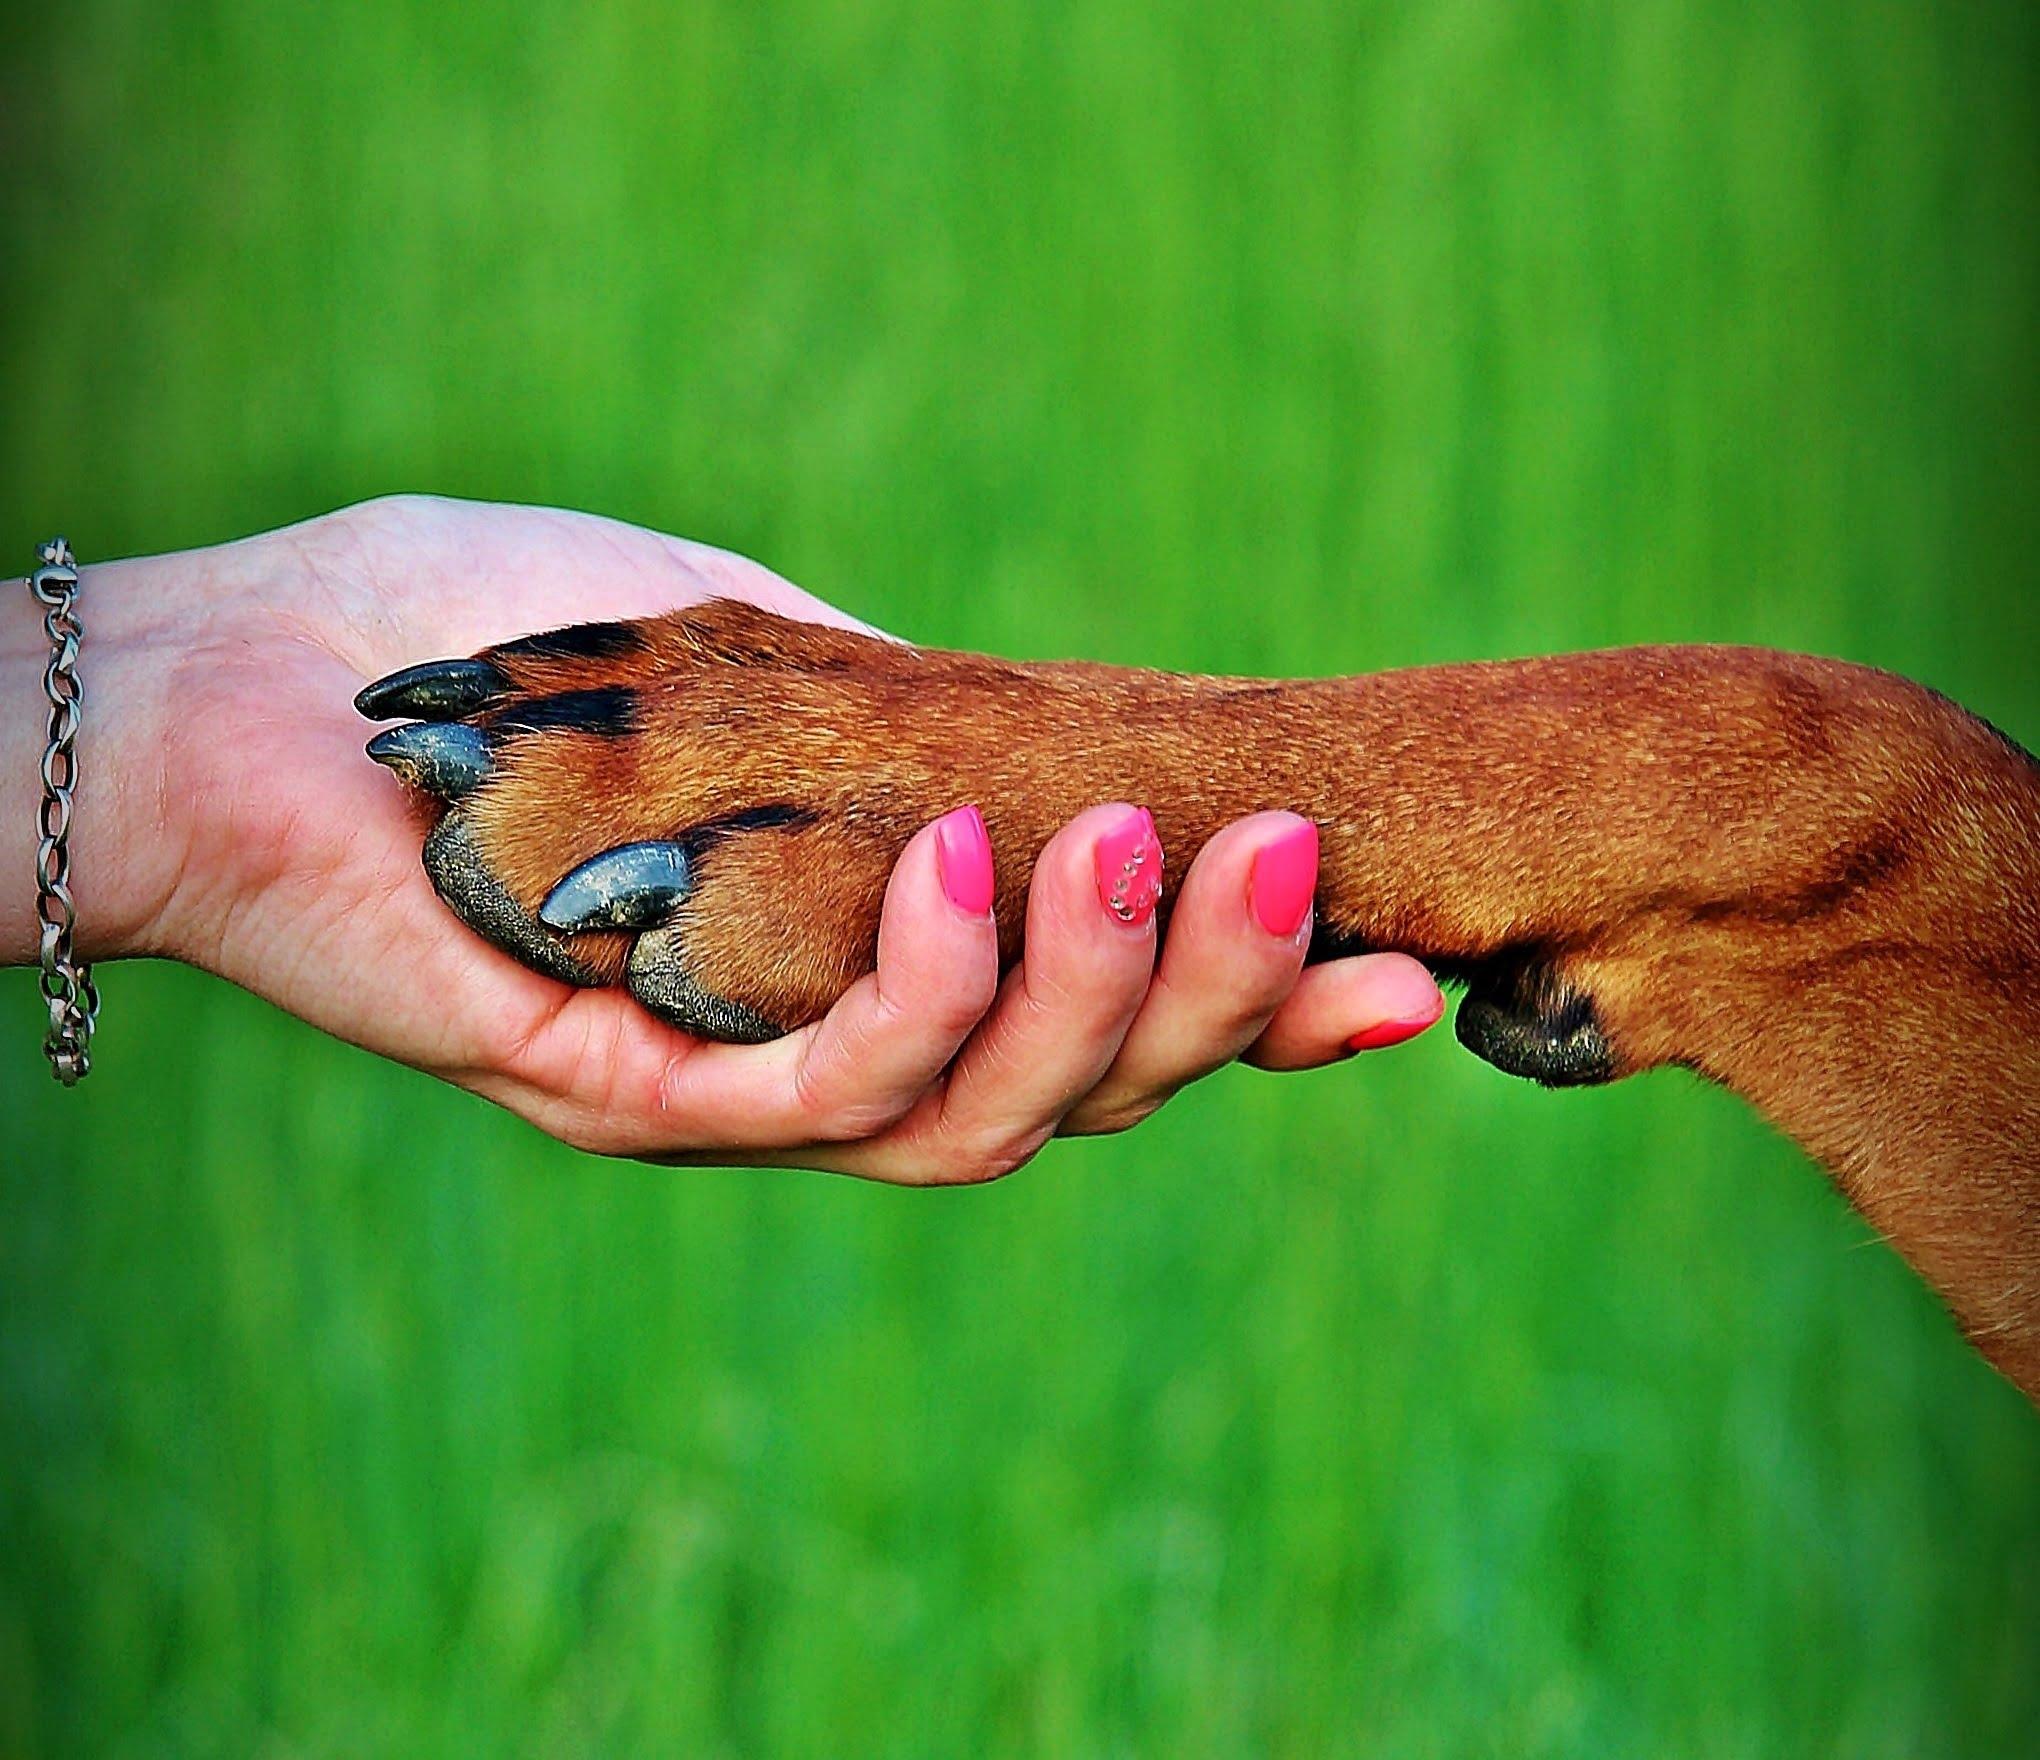 Tippek a zöld kutyatartáshoz